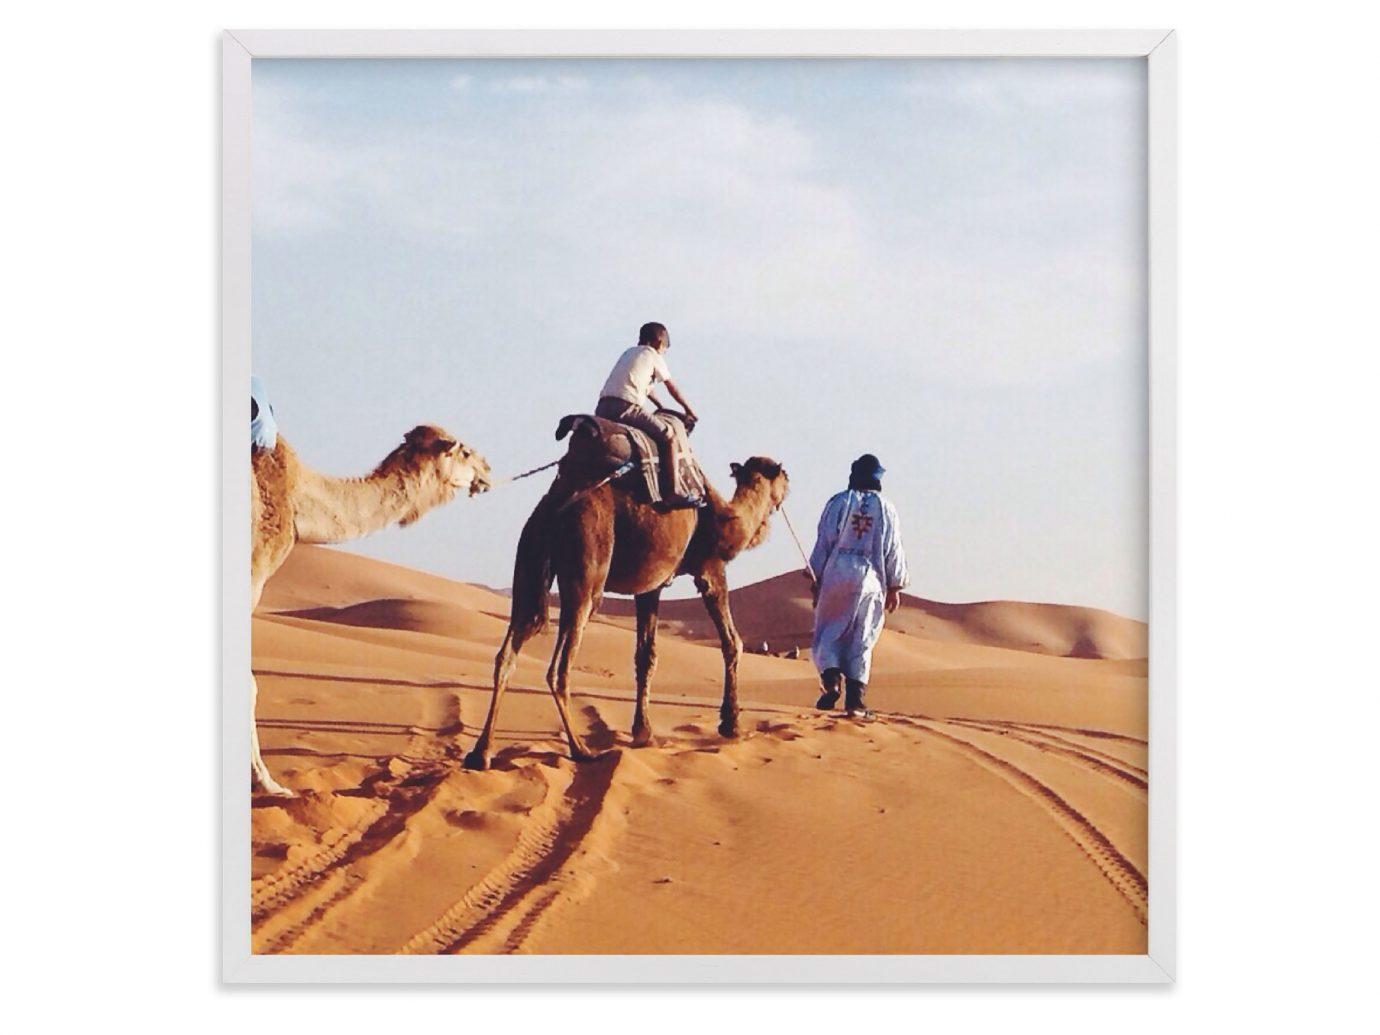 Style + Design Camel mustang horse landscape Desert sahara camel like mammal aeolian landform illustration